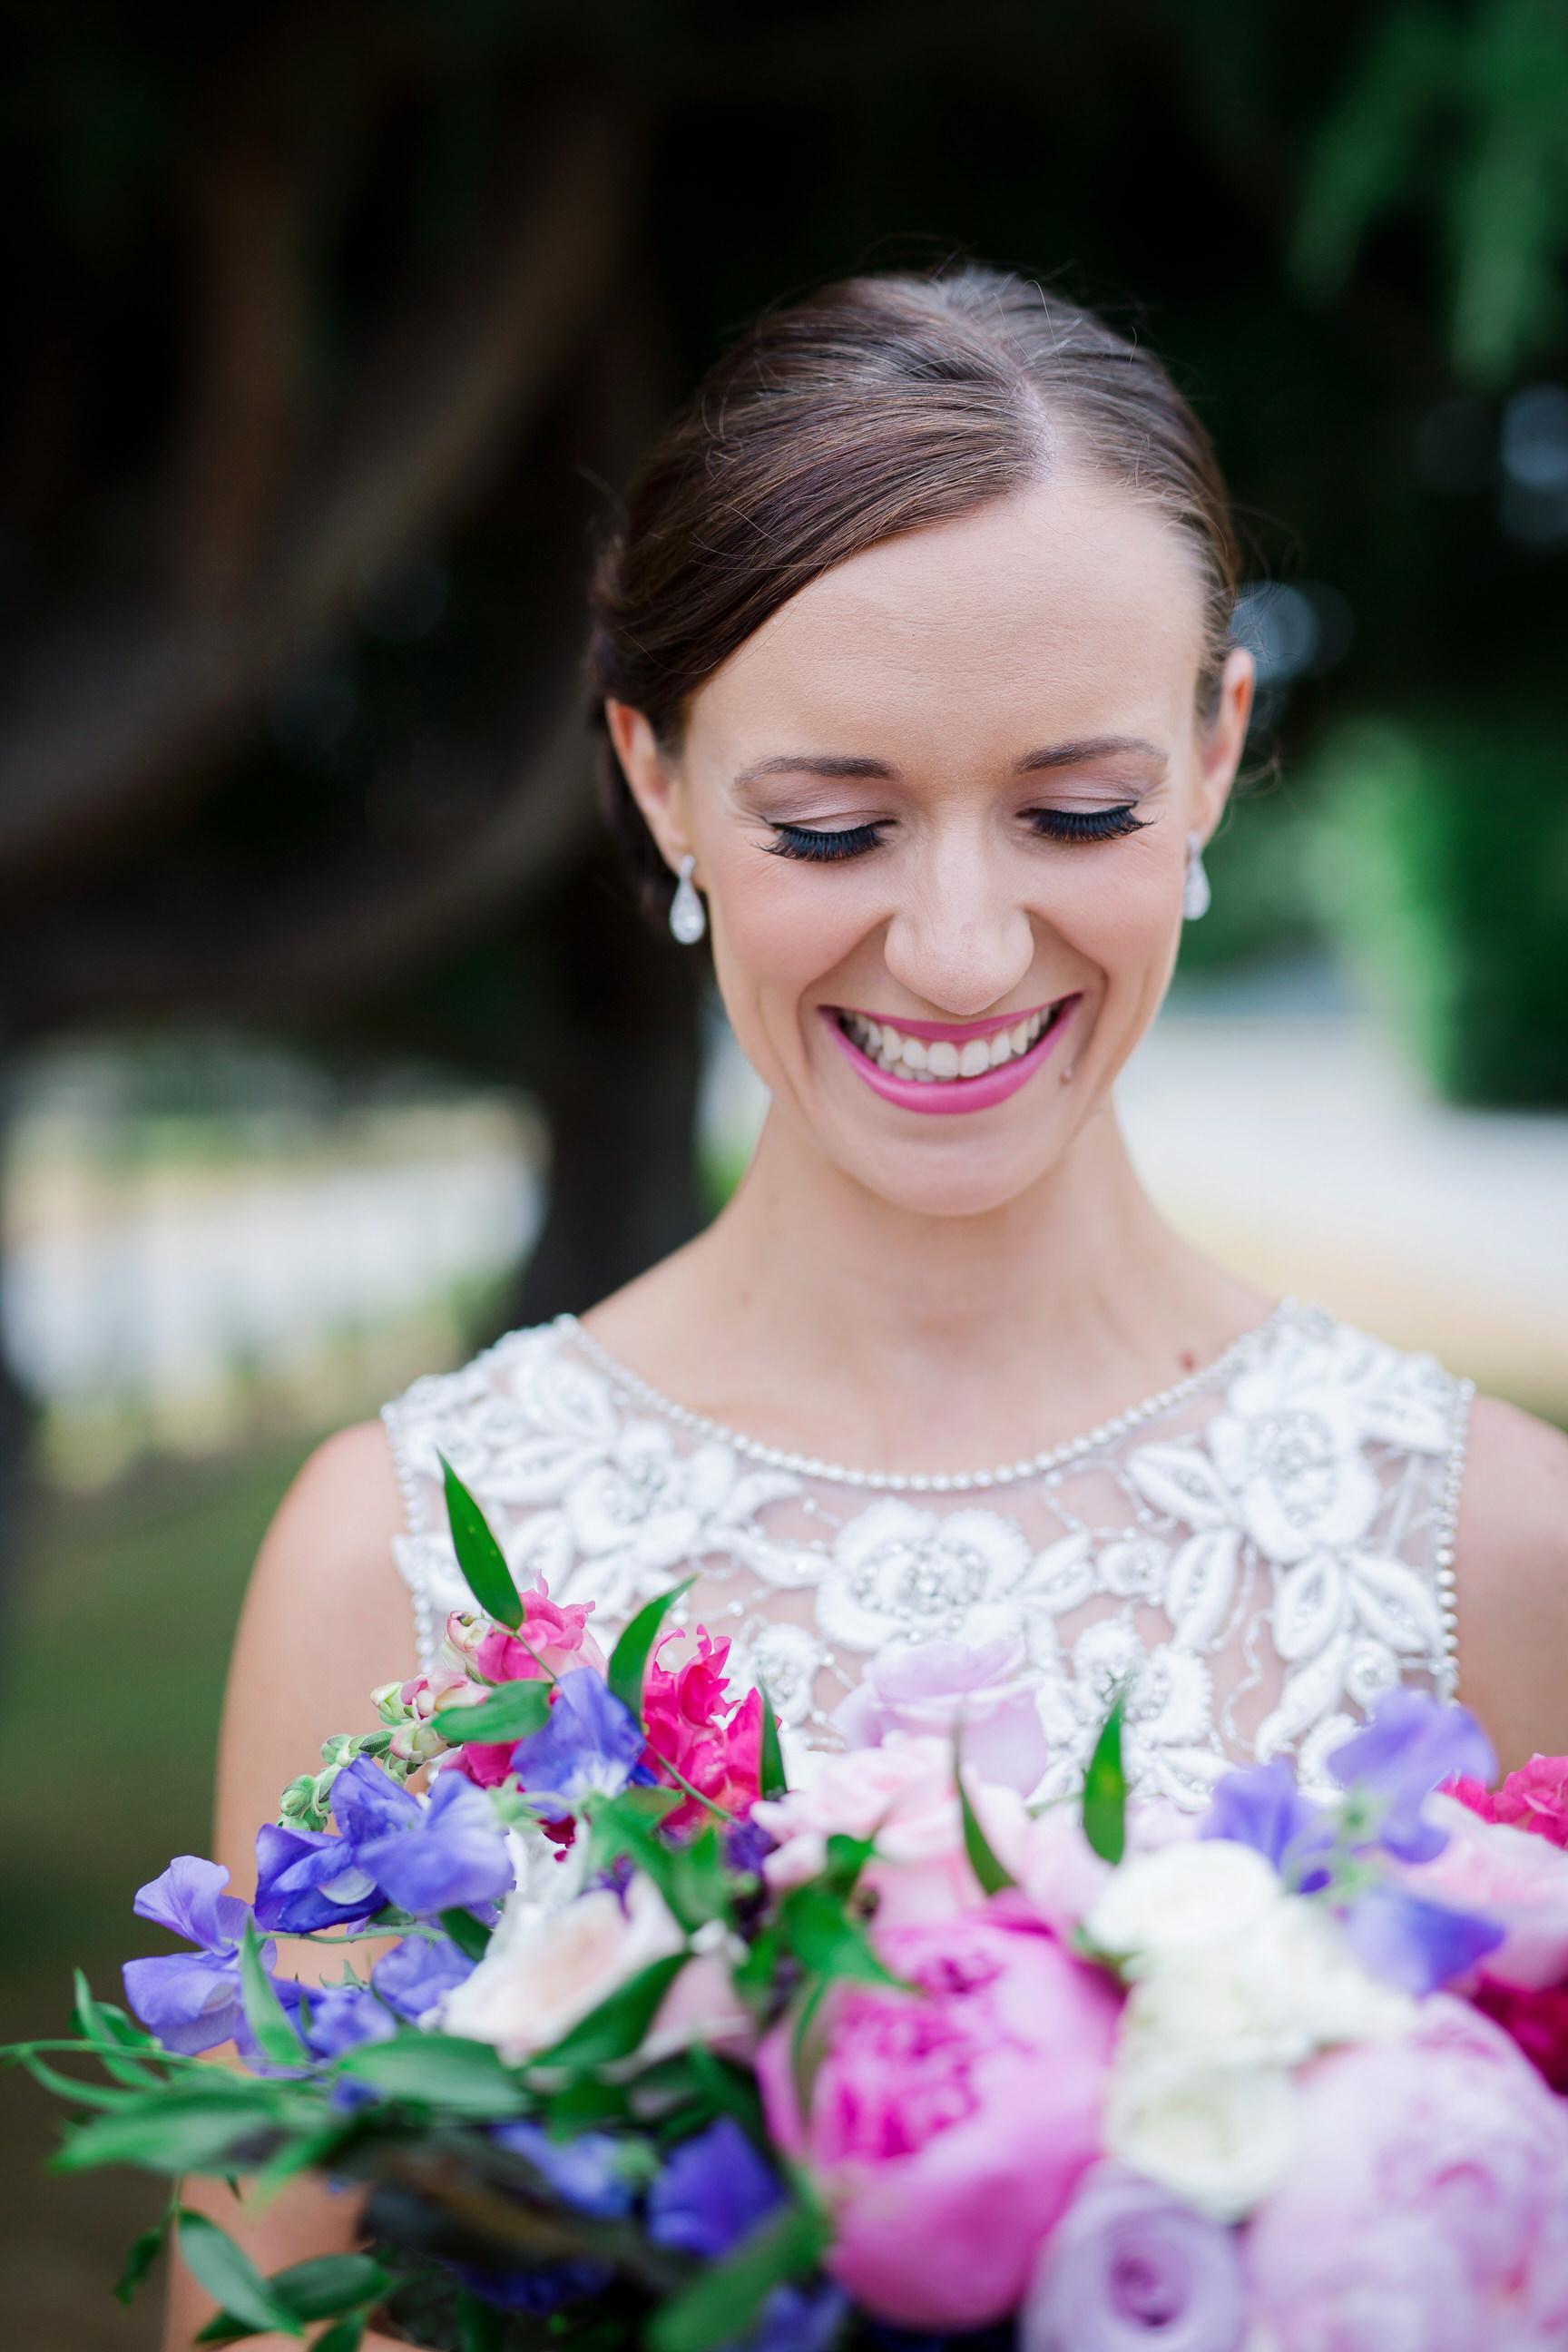 Martinborough-Poppies-Wedding-Caine-Eloise-Toni-Larsen-0044.jpg